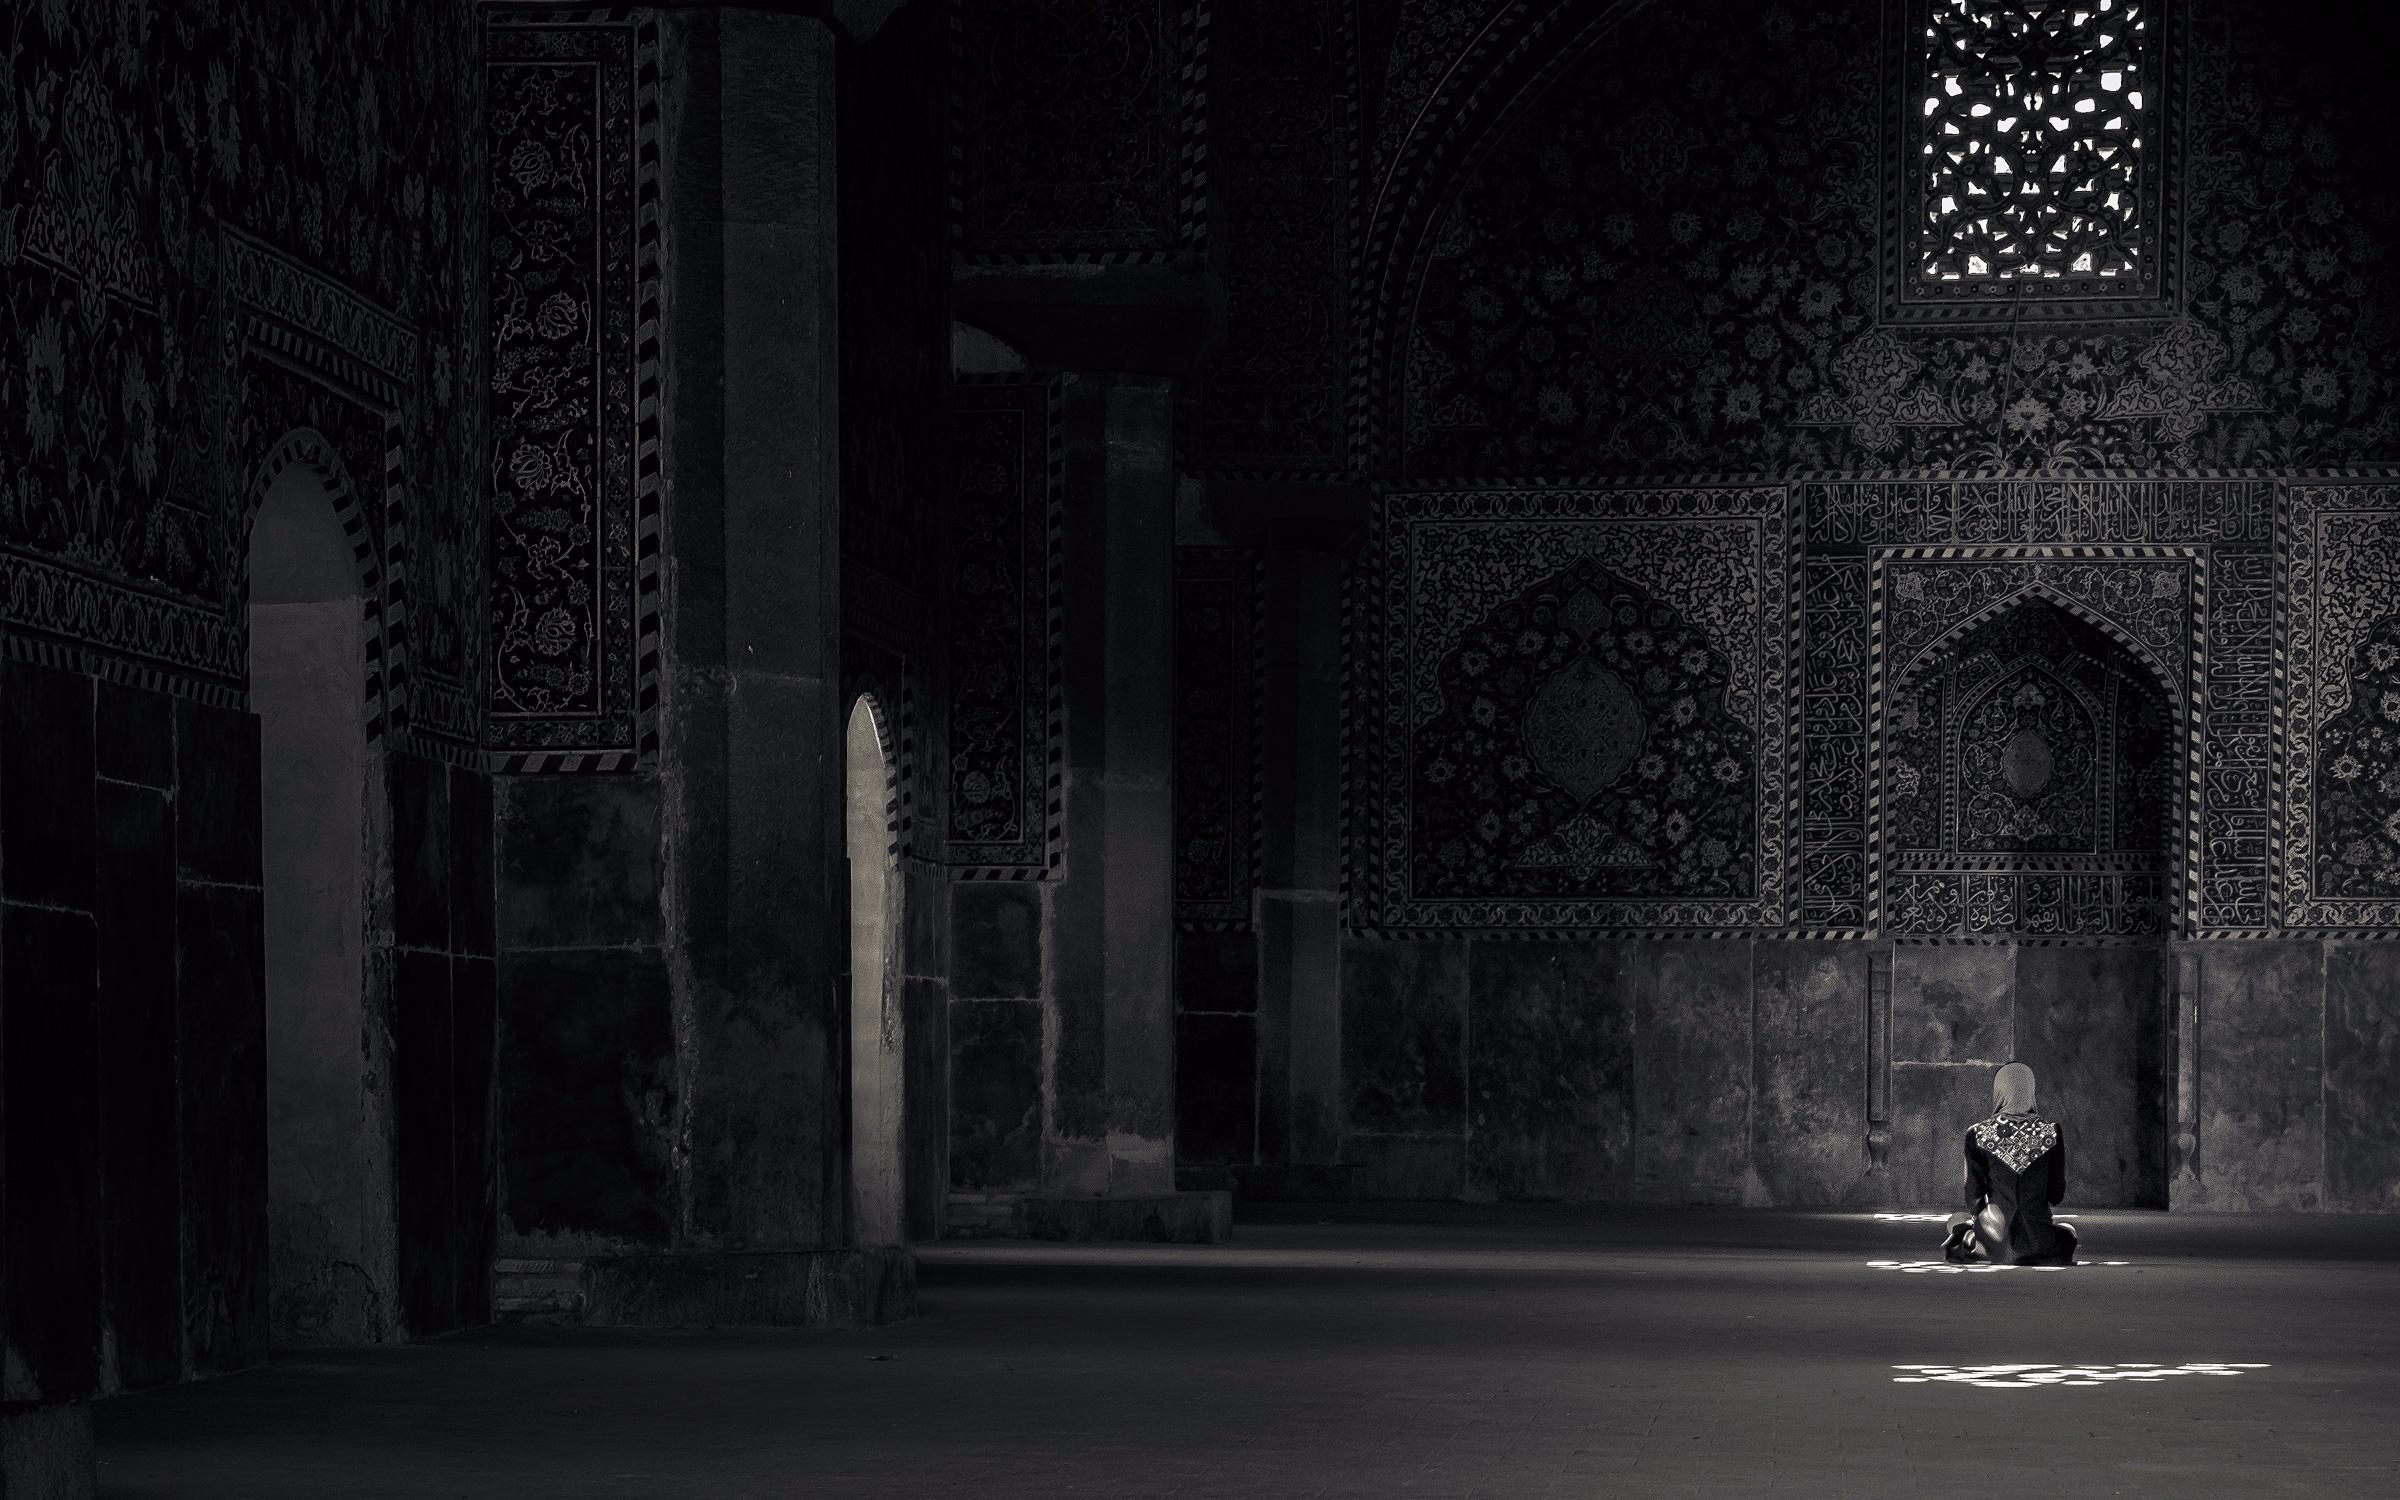 Silence middleeast - Iran, Isfahan - julian_k | ello